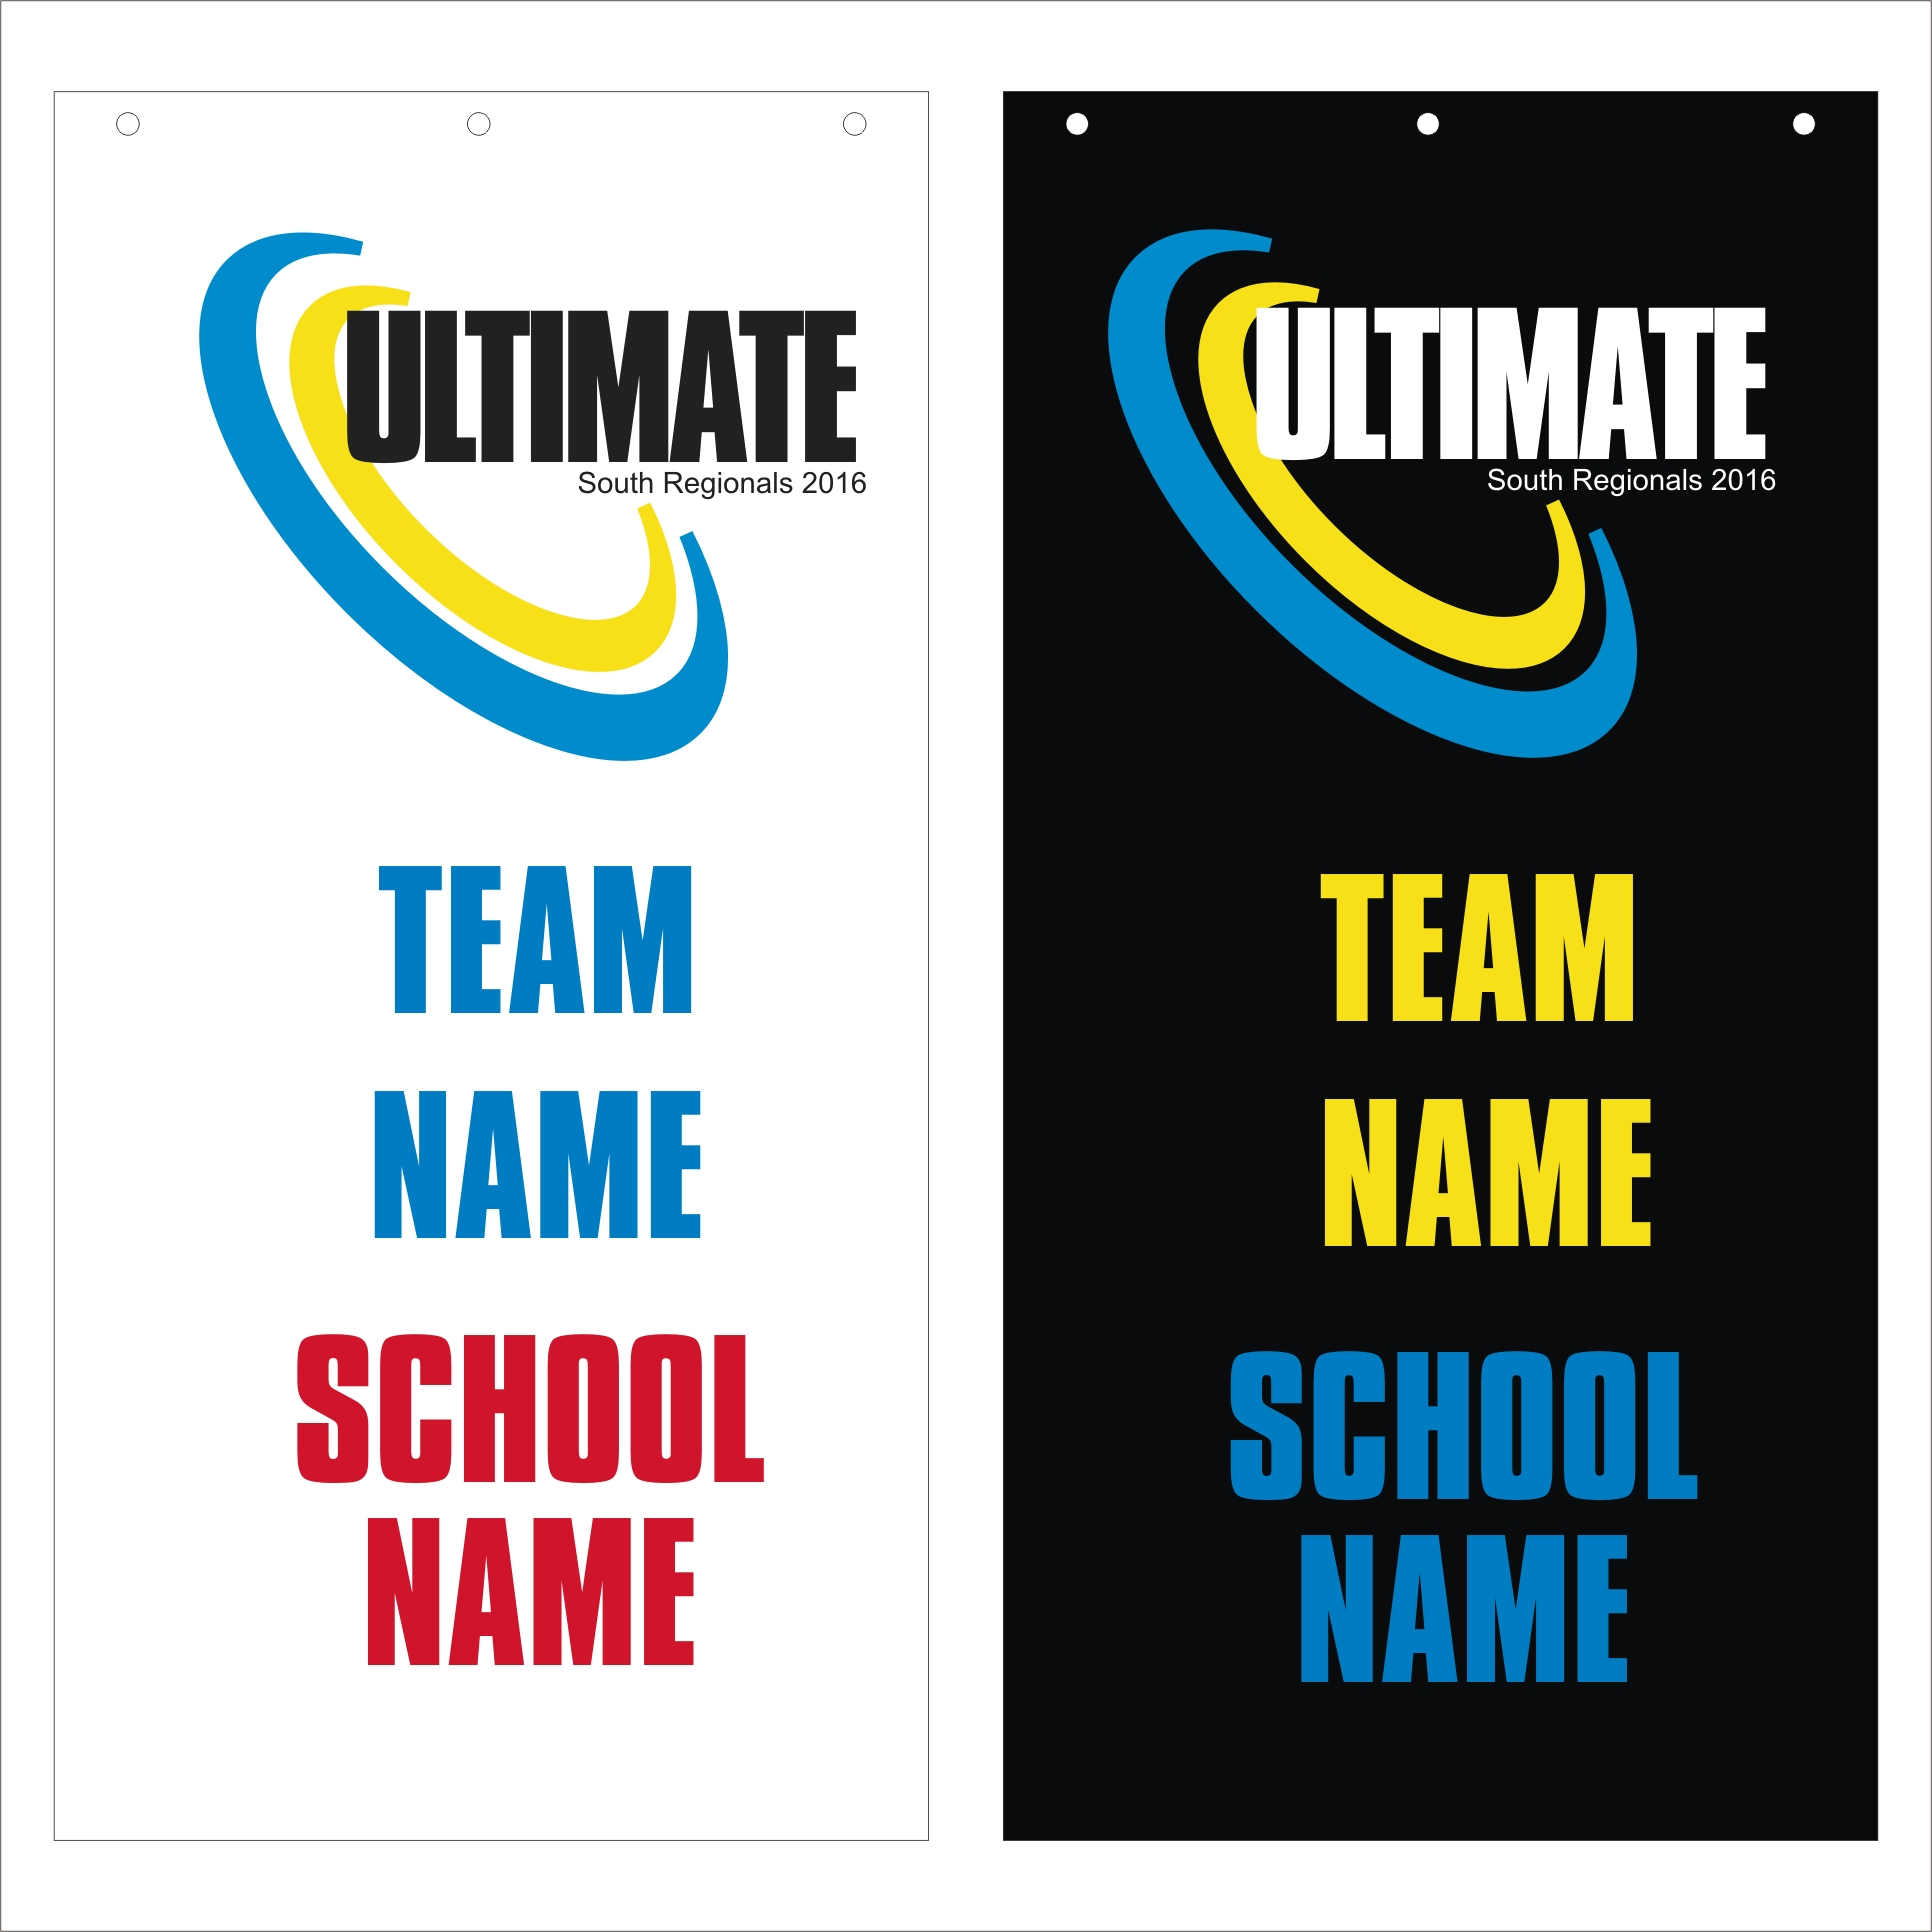 2016 Ultimate banner small.jpg